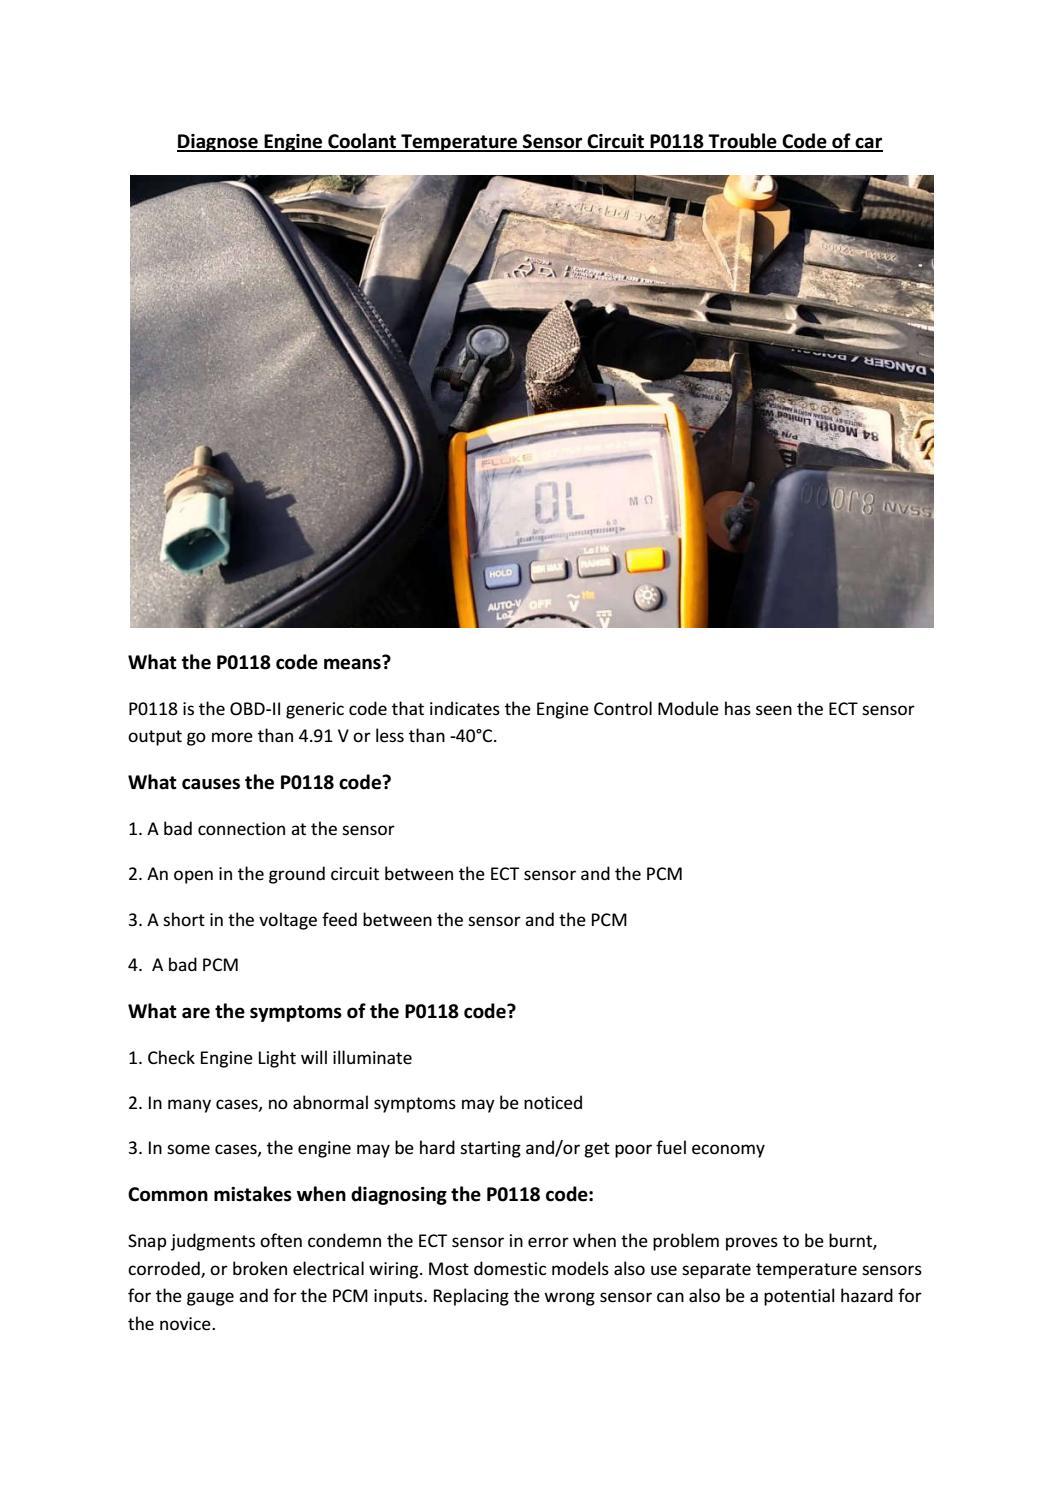 Partsavatar Car Parts, Canada - Diagnose engine coolant